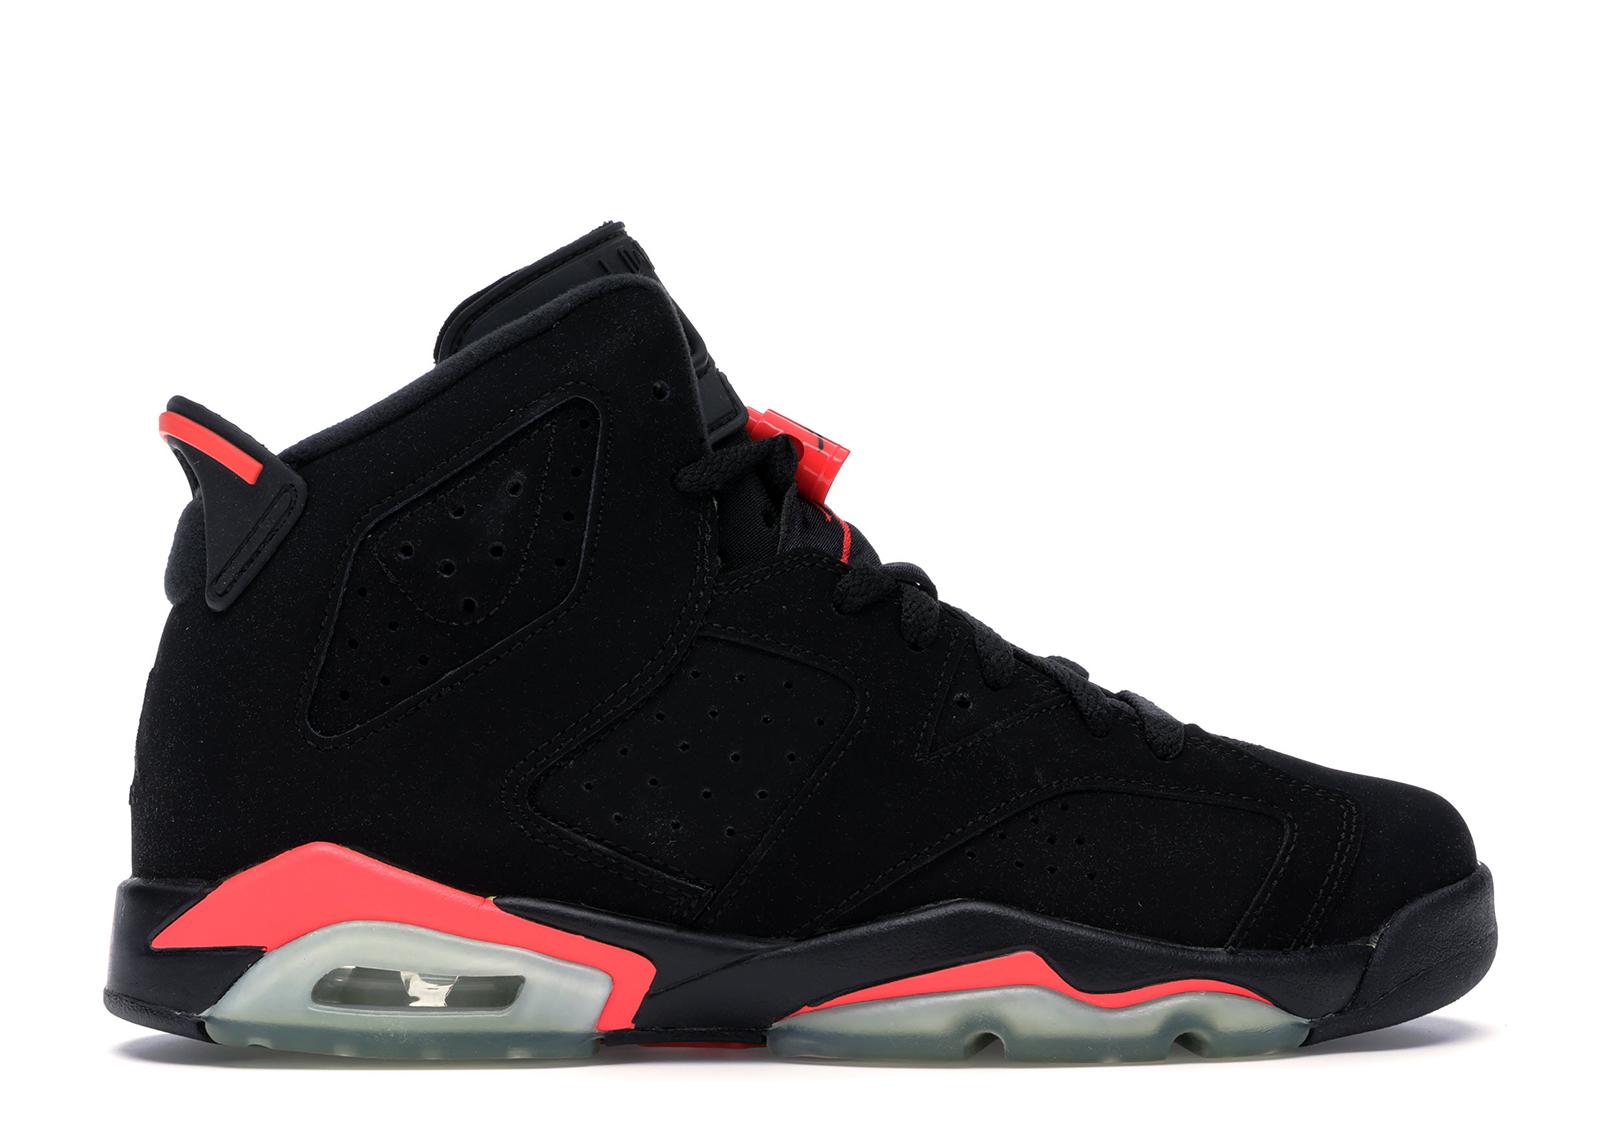 Jordan 6 Retro Infrared Black 2014 (GS